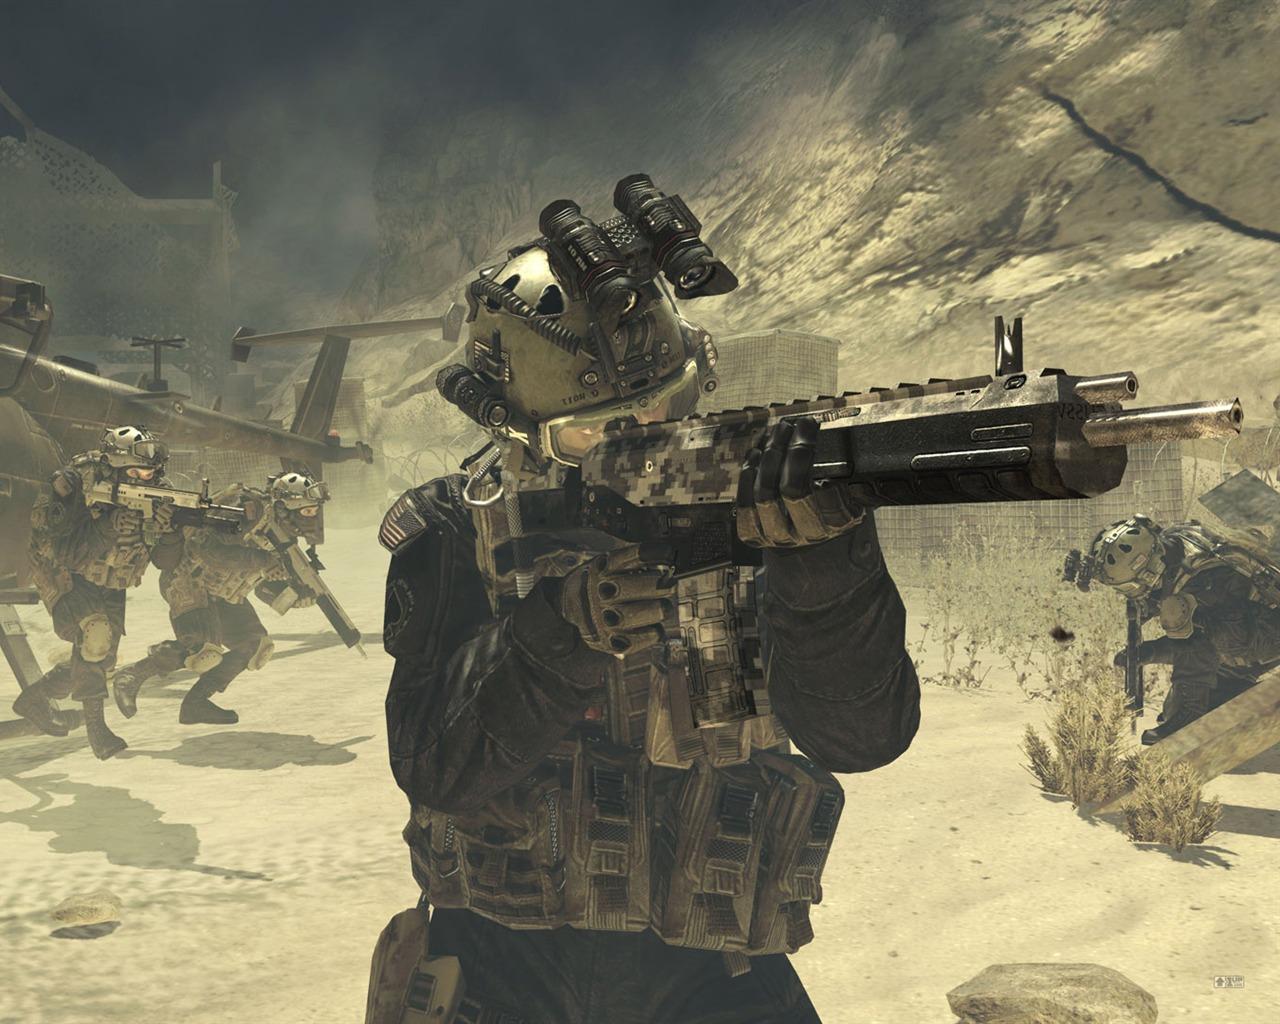 call of duty 6: modern warfare 2 hd wallpaper #15 - 1280x1024